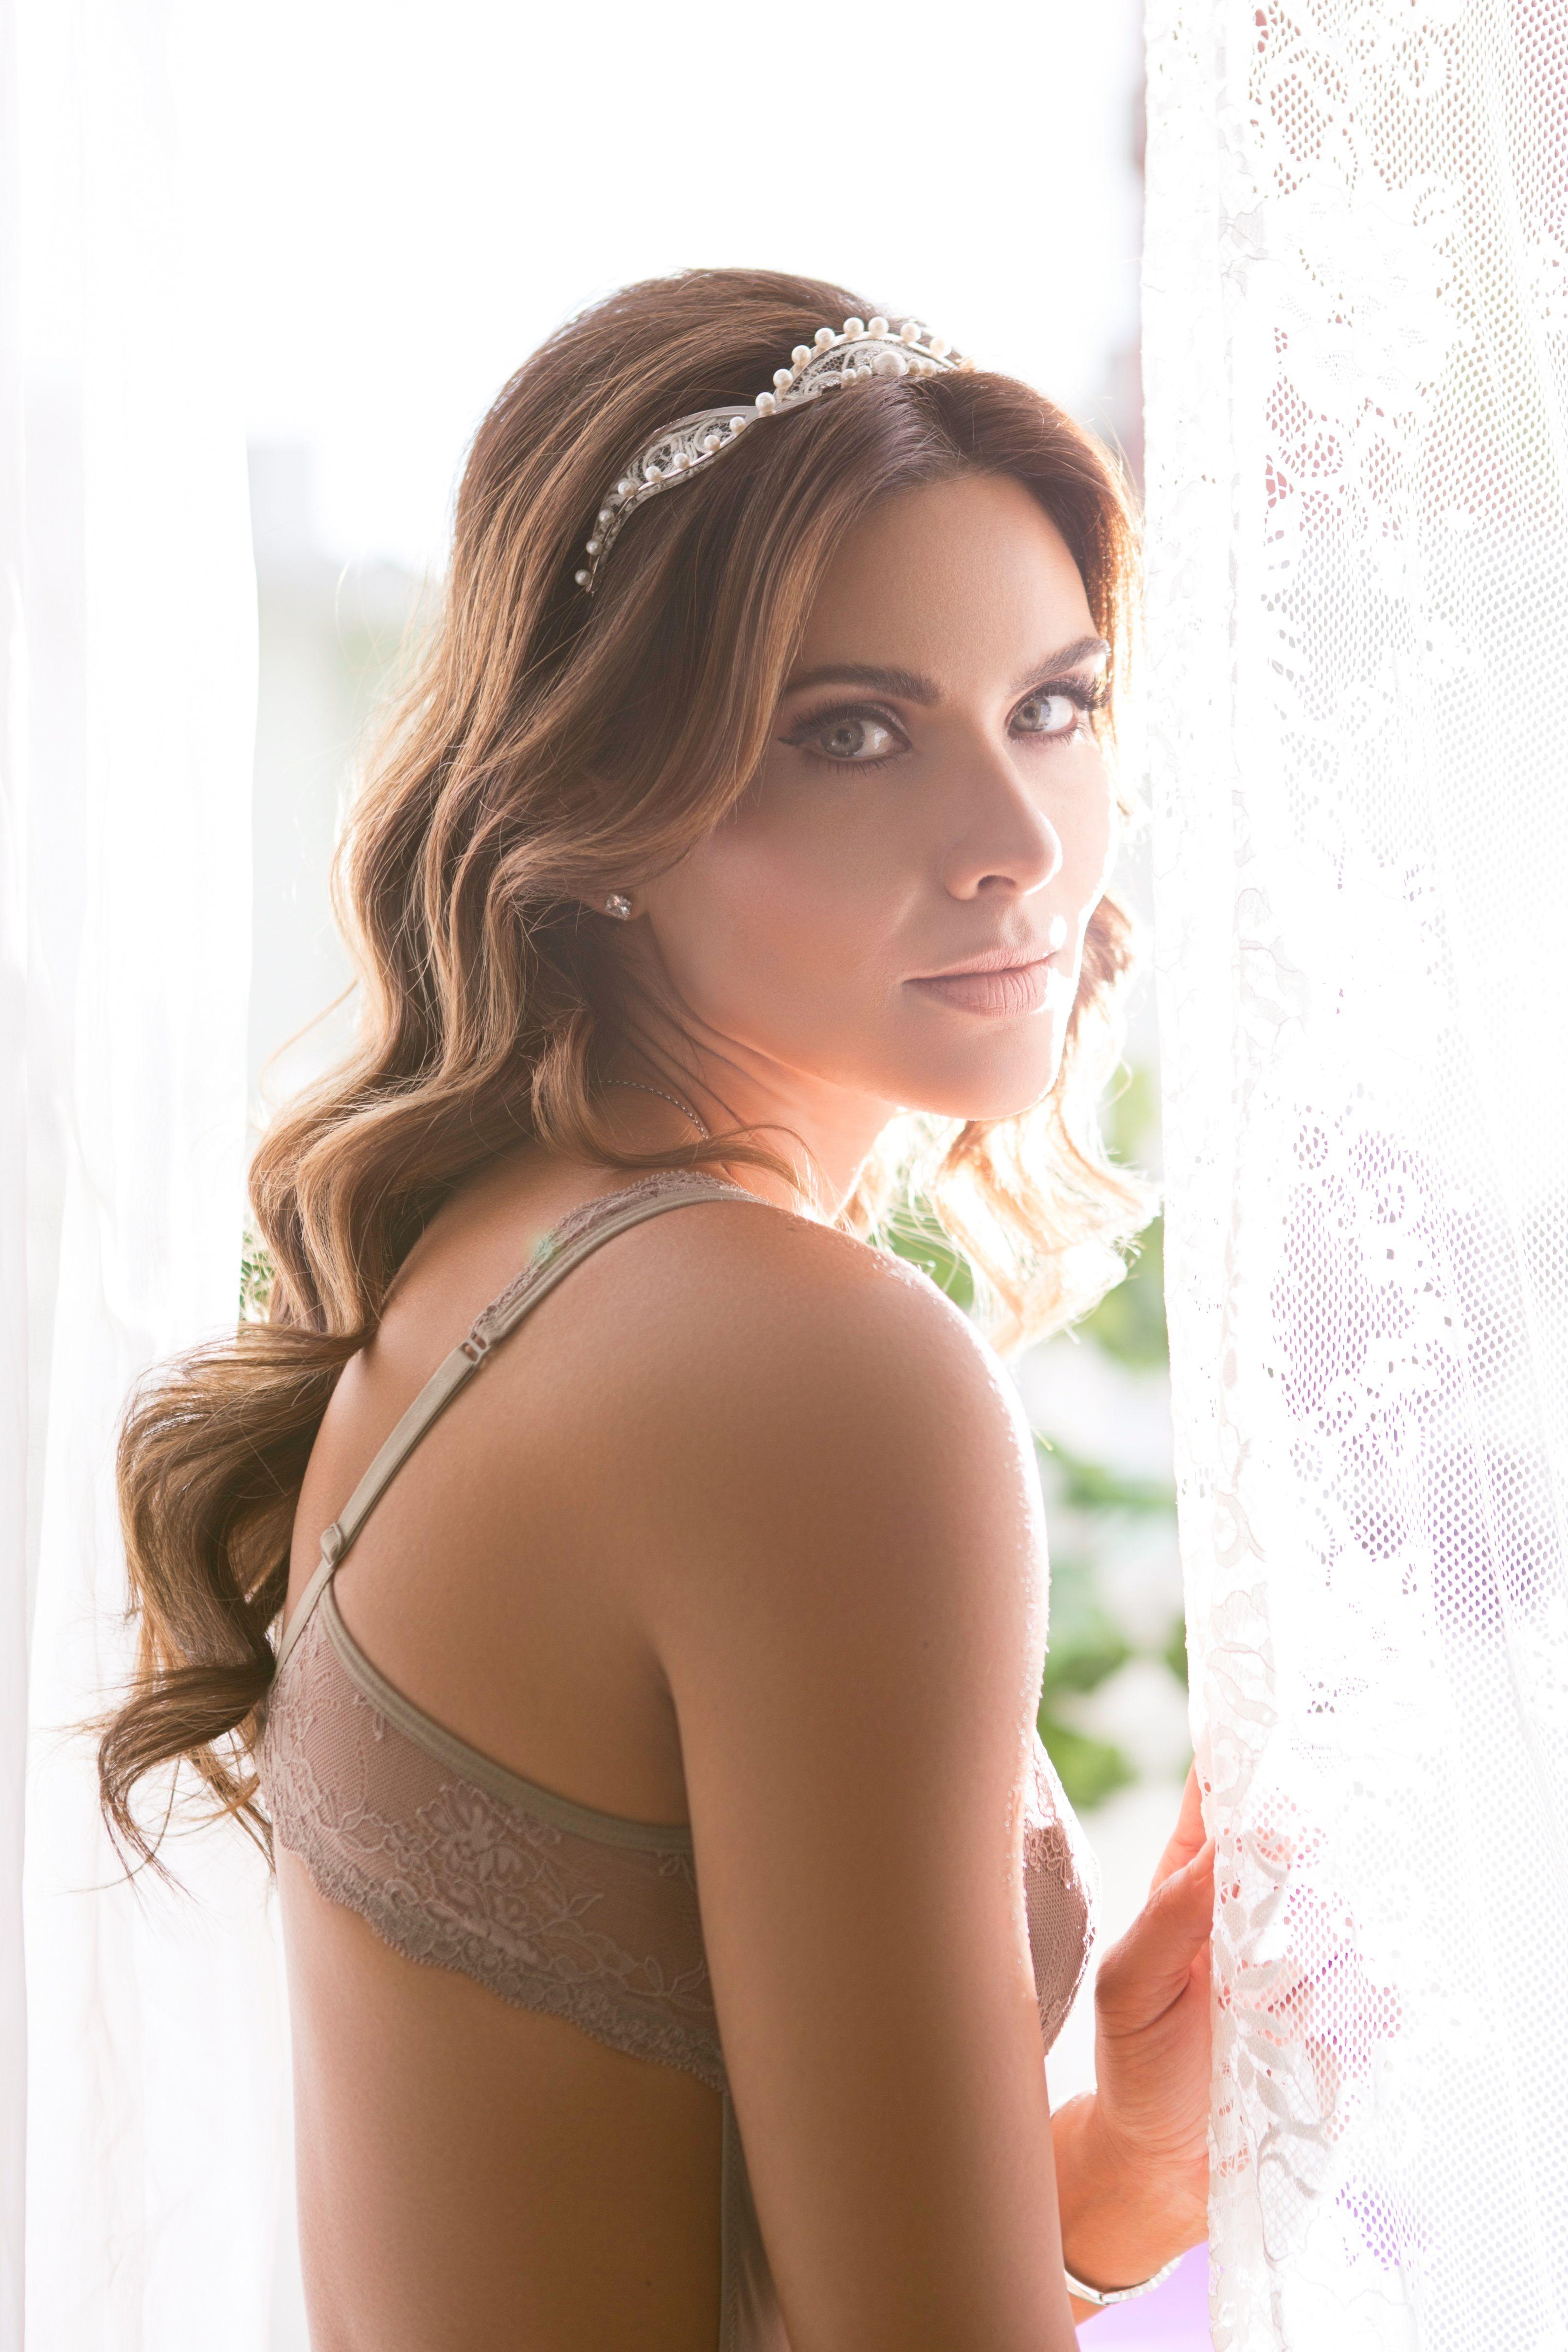 Editorial Bridal Beauty Br - Antes do Altar  Foto: @msteinmeyer  Makeup: @camilaadimakeup Hair: @daniferrarezi  Moda: @diegomontargil Acessórios: @carolbassijewelry Model: @monasantana